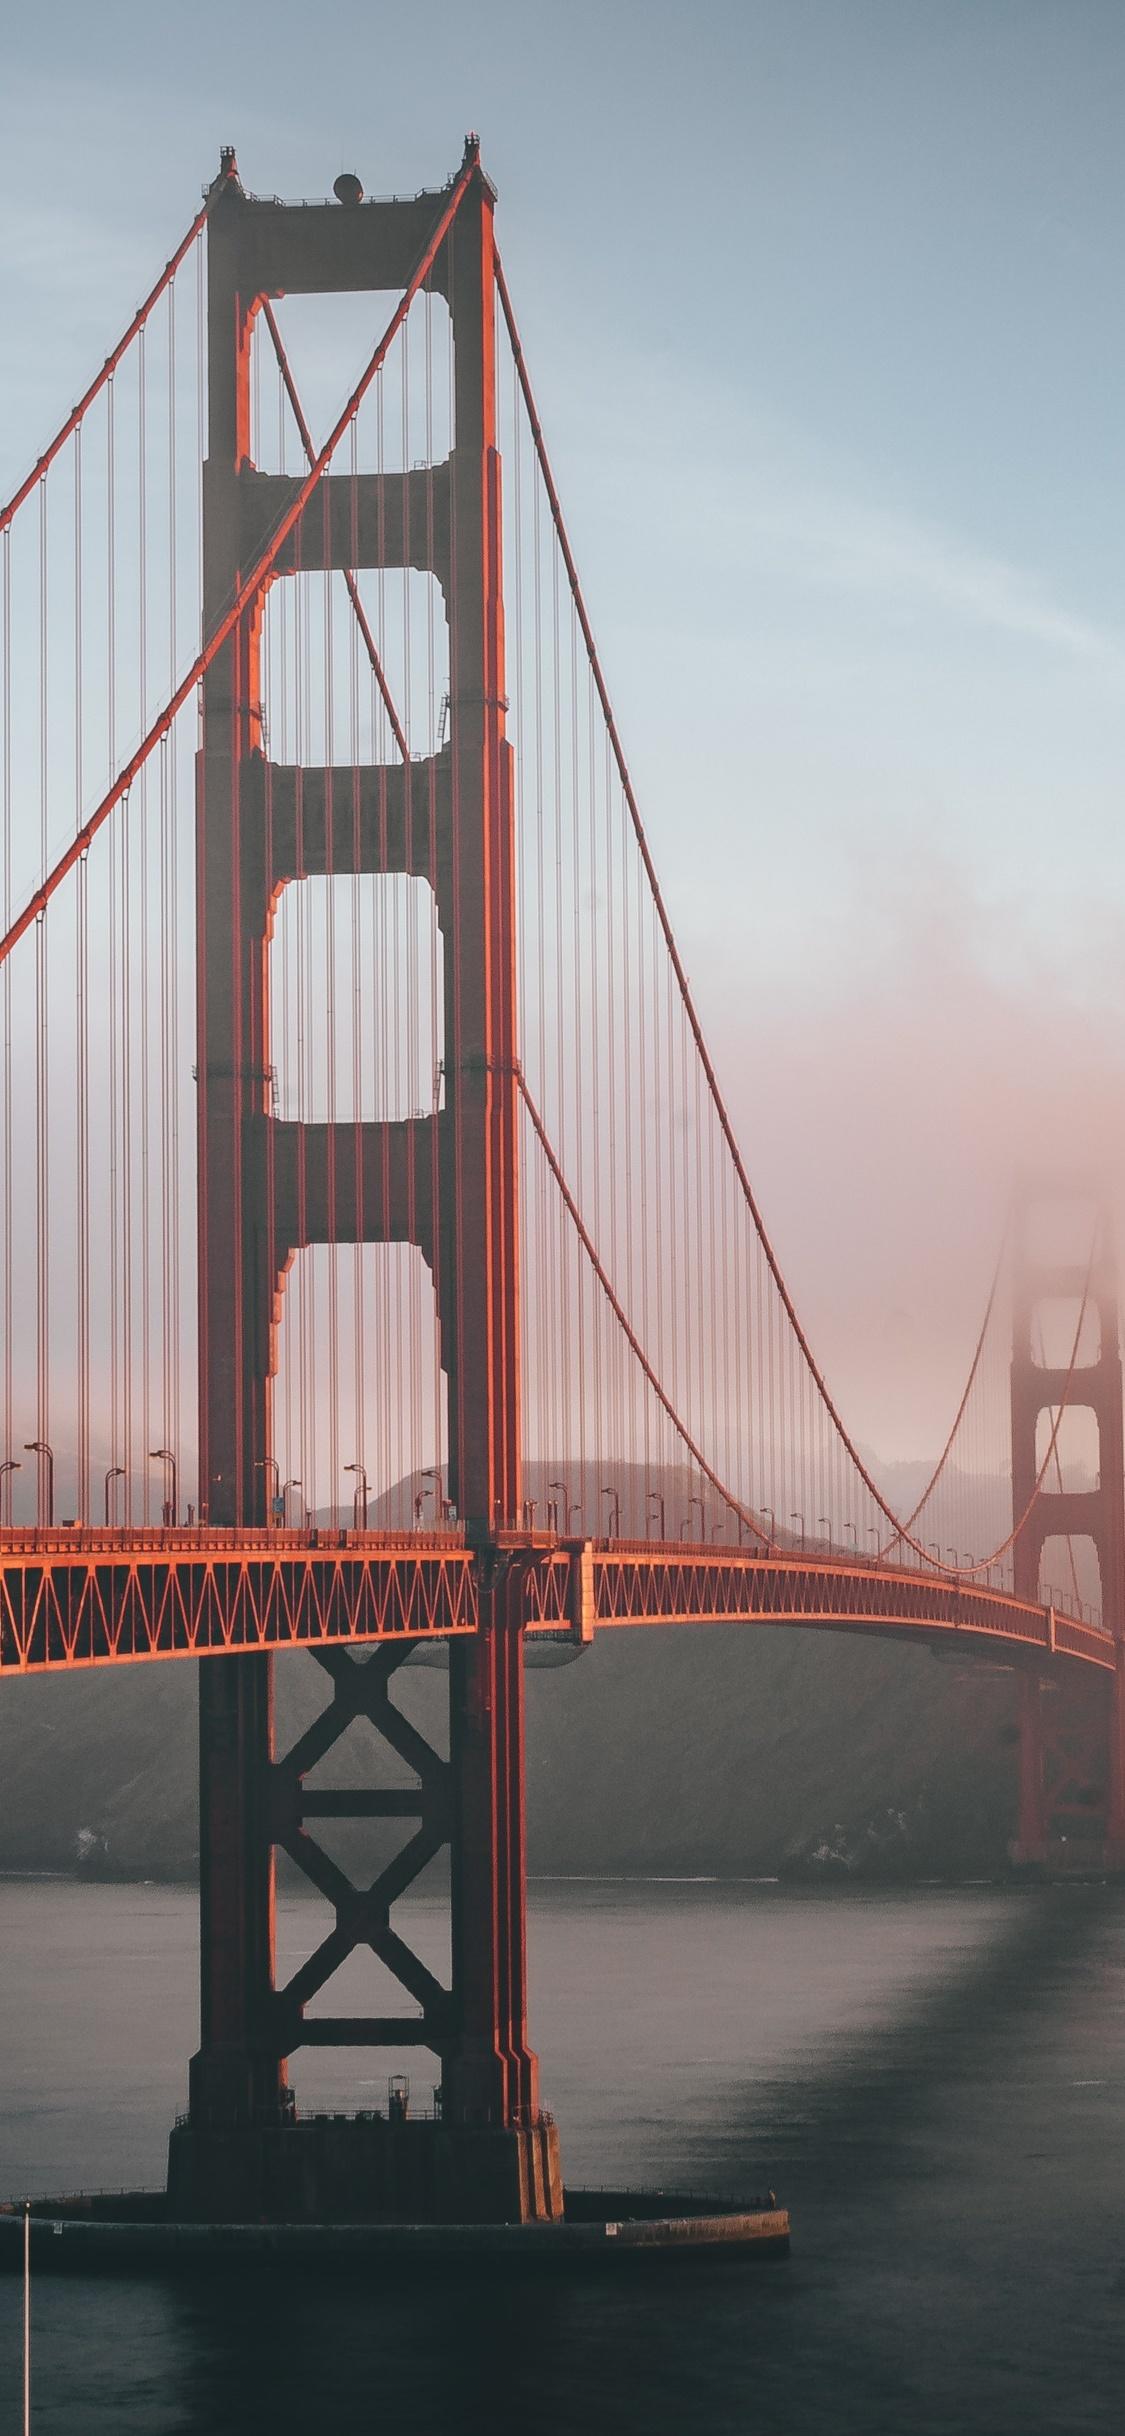 1125x2436 Golden Gate Bridge 5k Iphone Xs Iphone 10 Iphone X Hd 4k